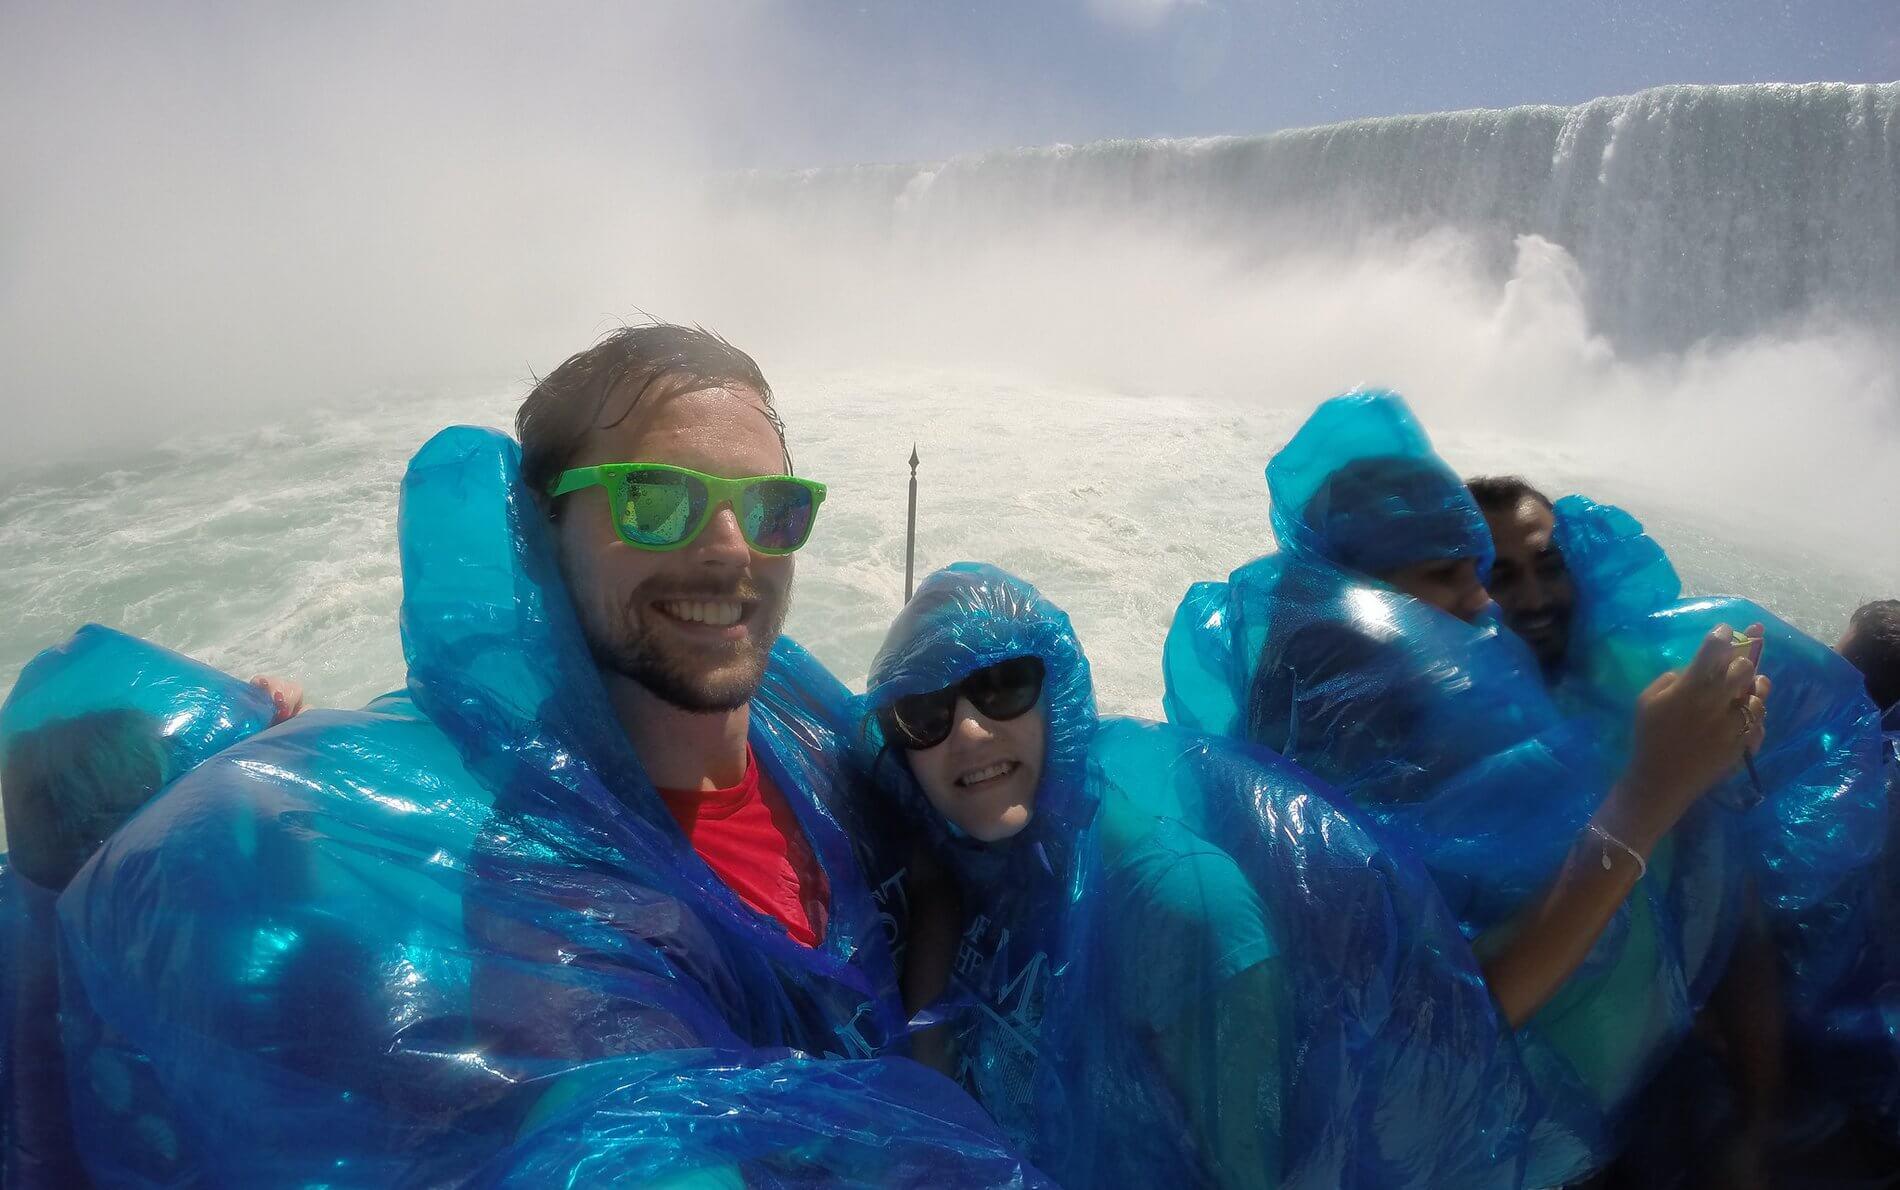 Family, Niagara Falls, and Toothache in Ontario